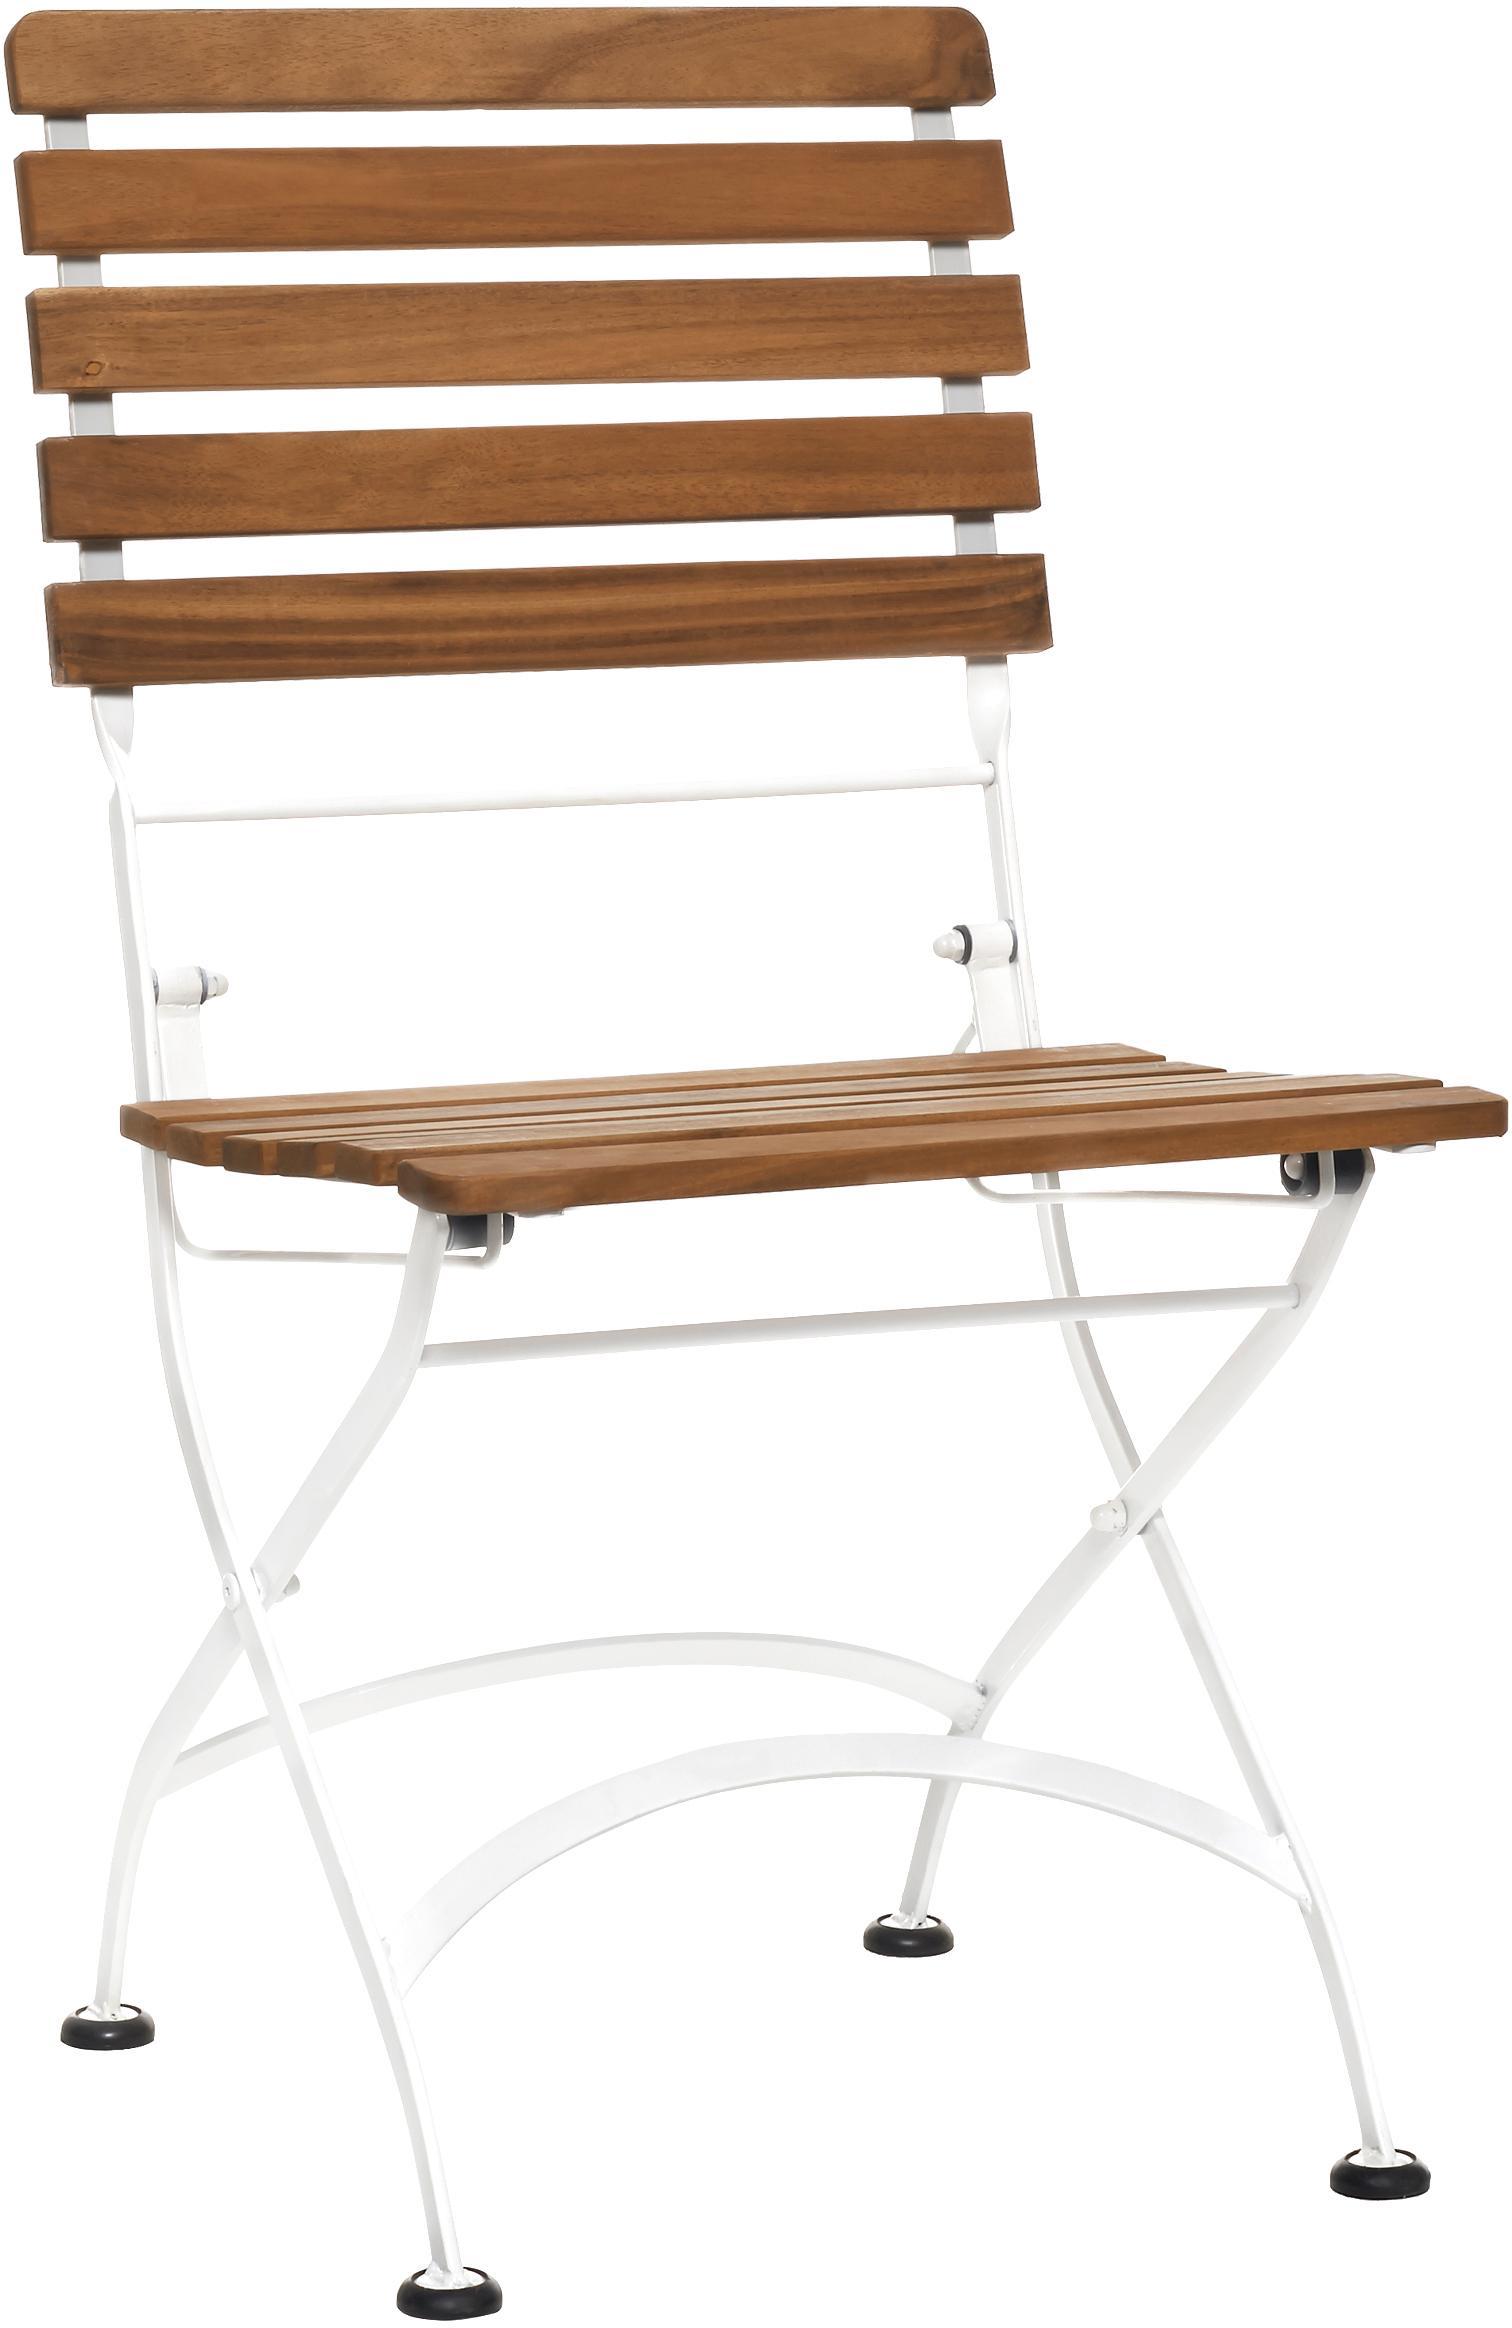 Sillas plegables de exterior Parklife, 2uds., Asiento: madera de acacia aceitada, Estructura: metal galvanizado con pin, Blanco, madera de acacia, An 47x F 59 cm